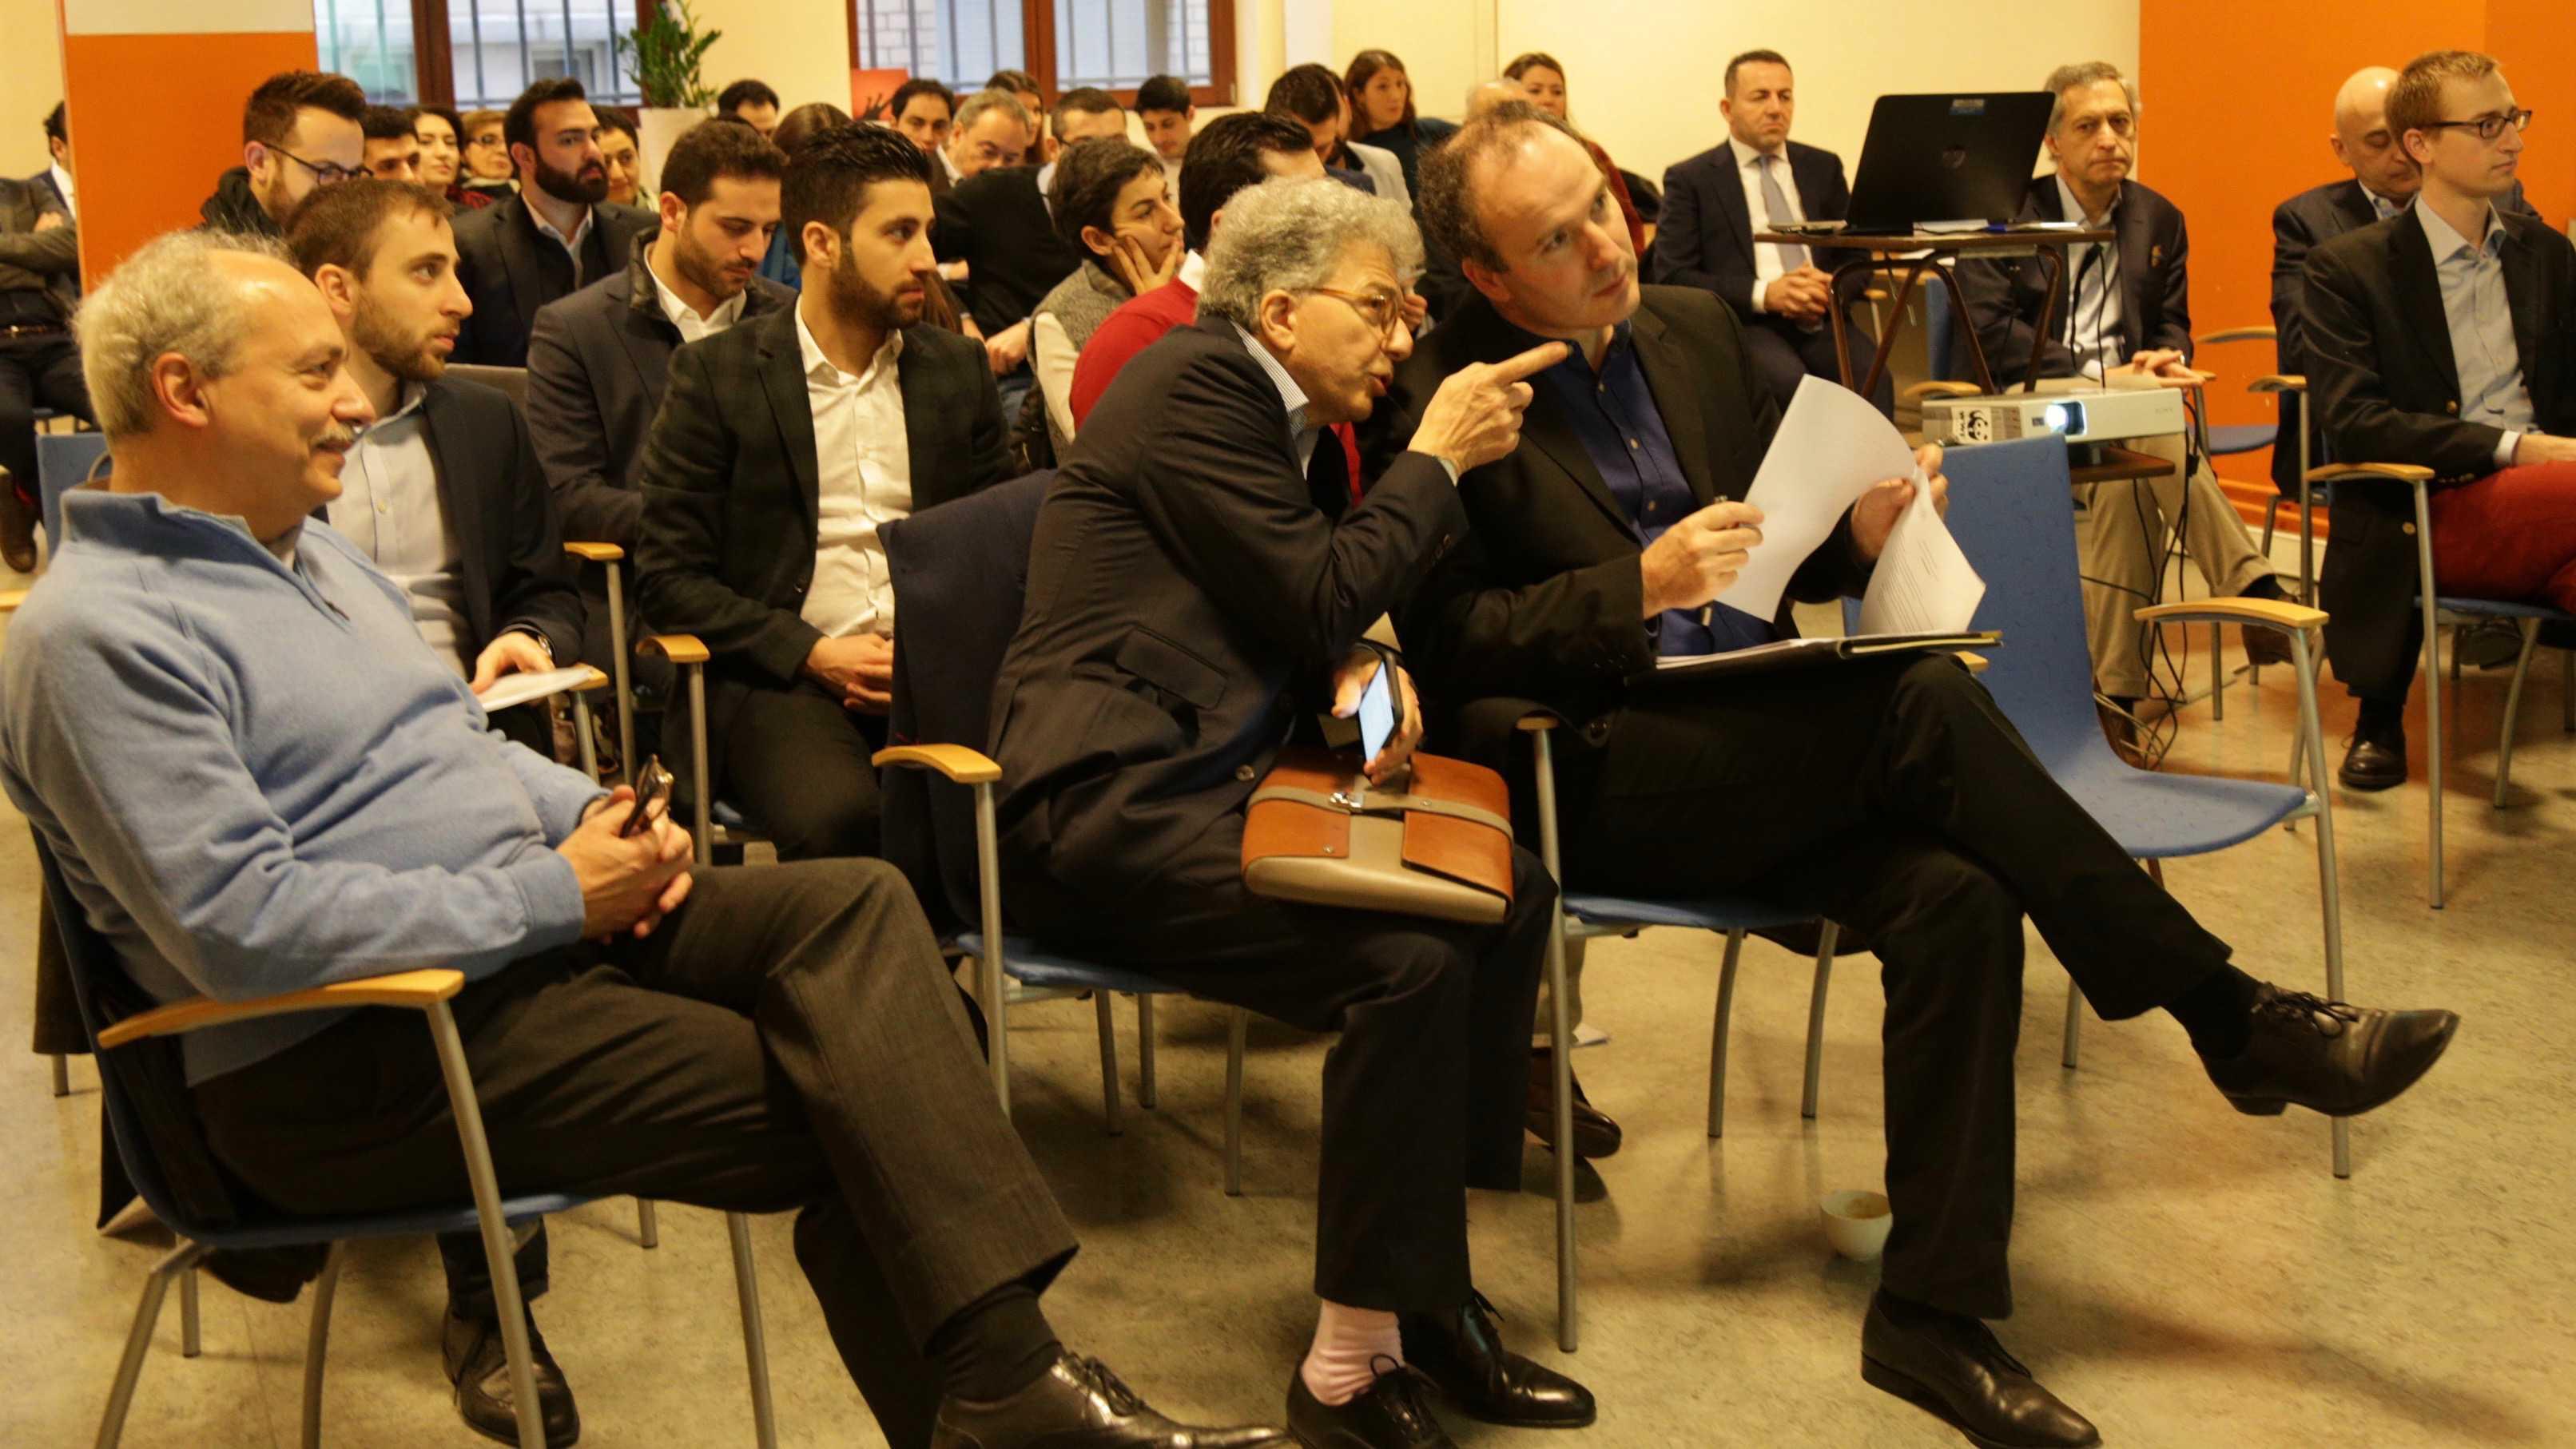 2017 Europe Summit.4